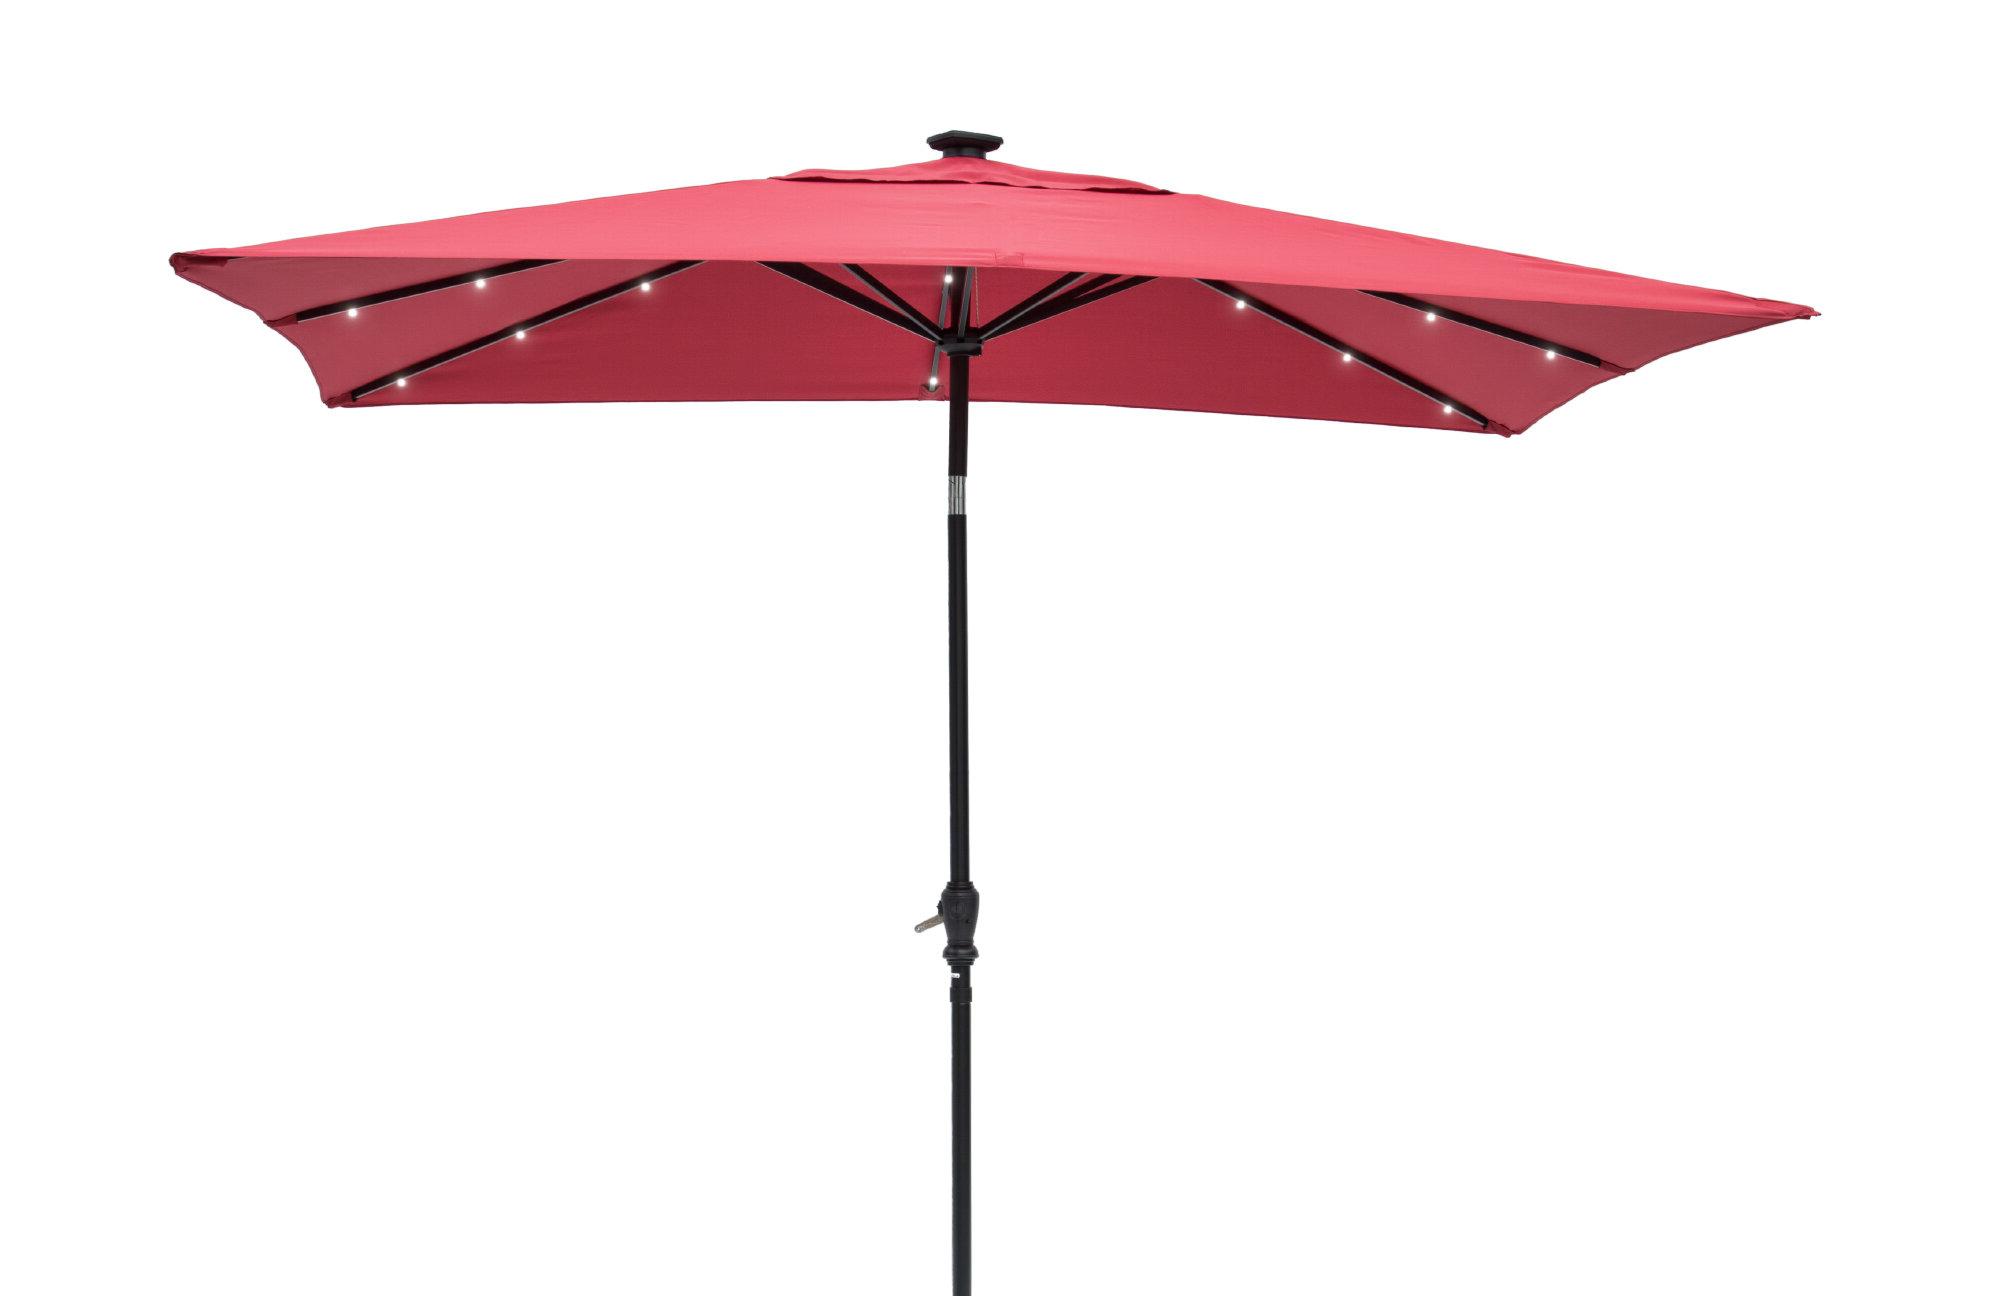 Most Popular Griselda Solar Lighted  Rectangular Market Umbrellas Intended For Griselda Solar Lighted 9' X 7' Rectangular Market Umbrella (Gallery 1 of 20)